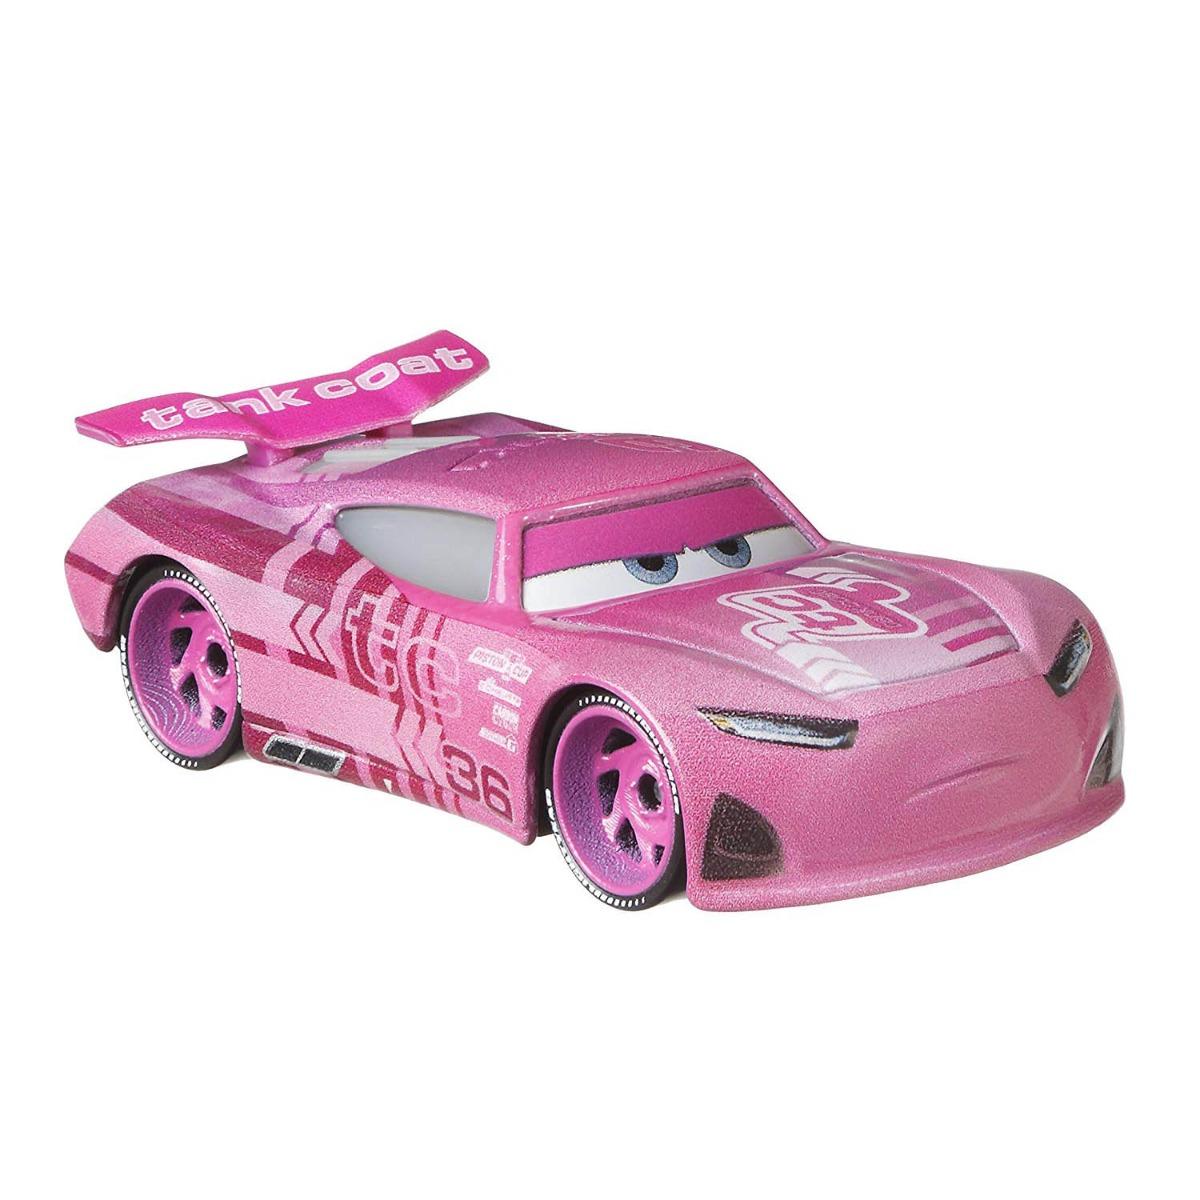 Masina Cars Die Cast Rich Mixon, Fll32